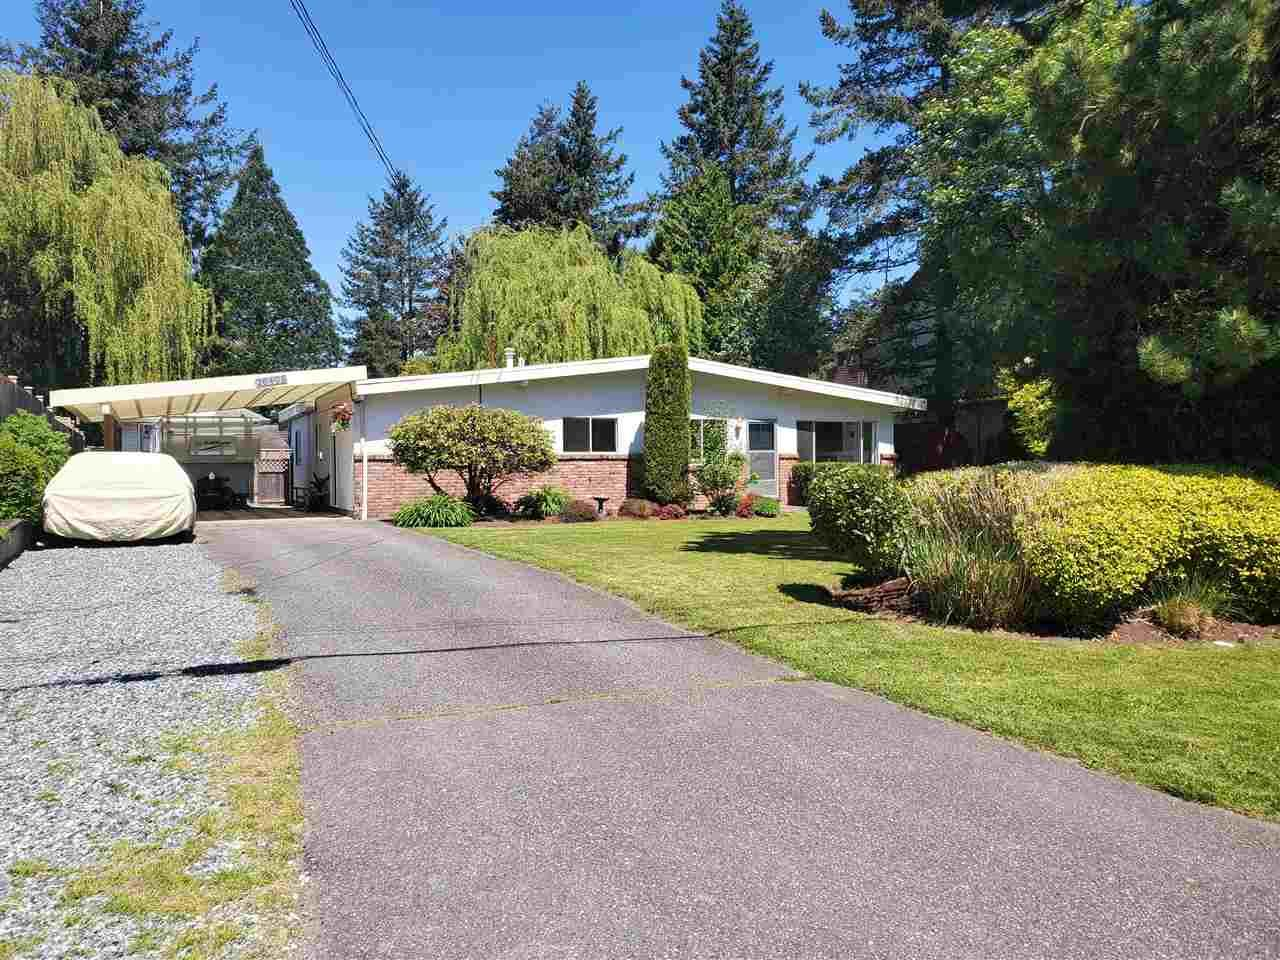 "Main Photo: 26493 28B Avenue in Langley: Aldergrove Langley House for sale in ""ALDERGROVE"" : MLS®# R2455229"